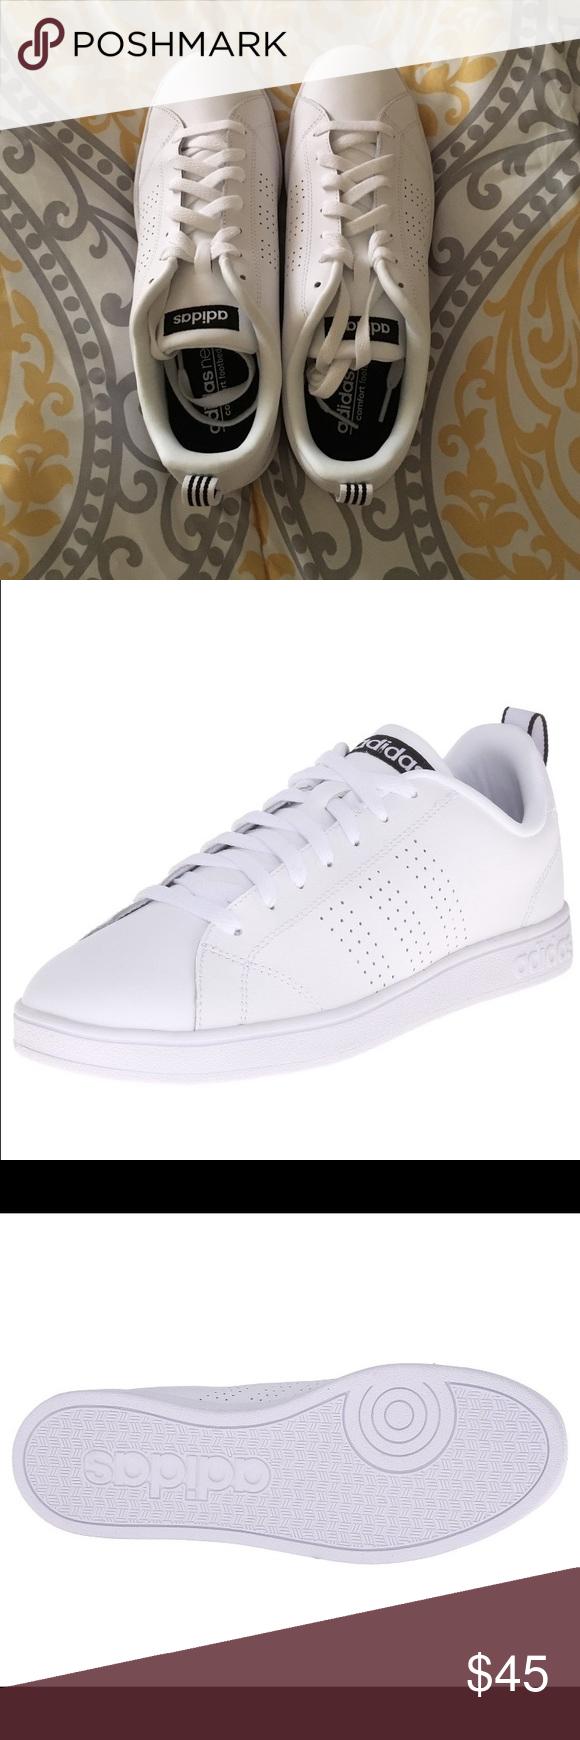 riservato a taylor m donne e 'tutto bianco neo adidas nwt adidas